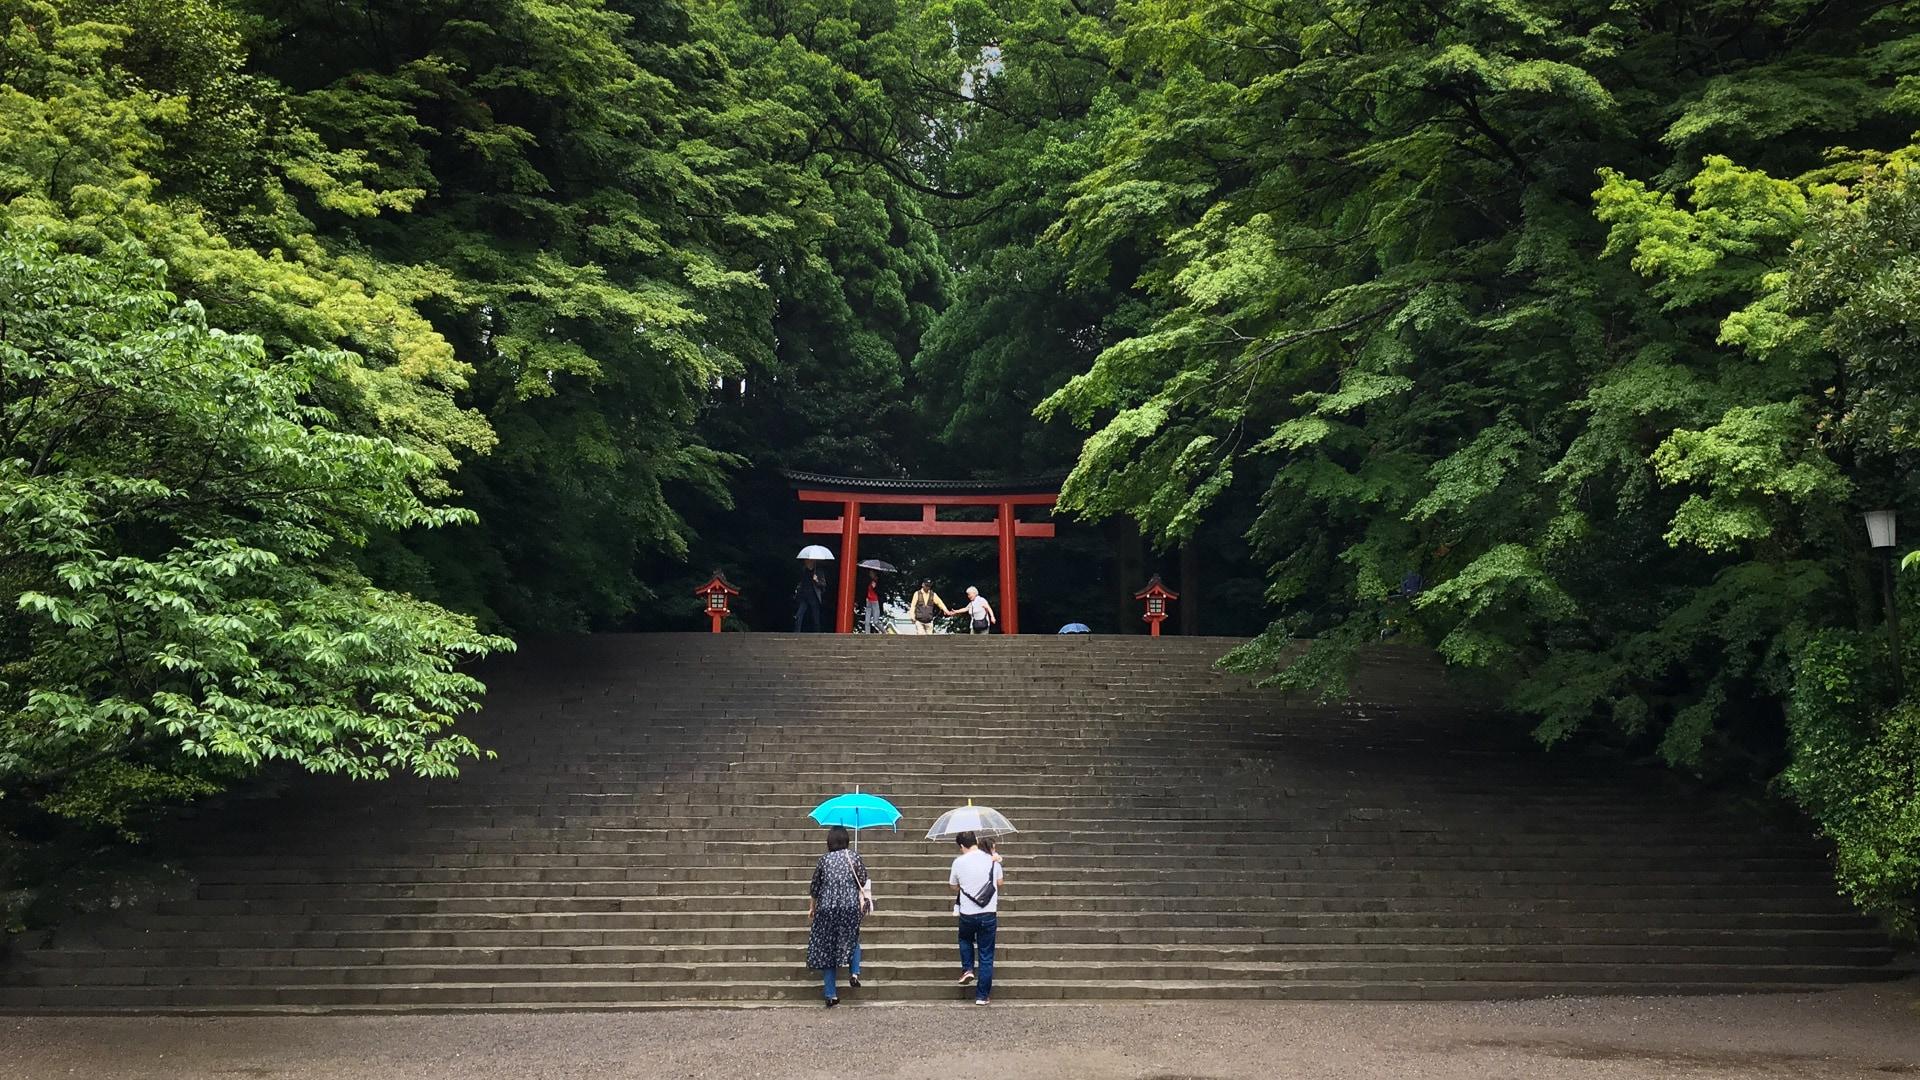 Kirishima - Kyushu - JESUS RODRIGUEZ, FOTOGRAFIA DE NATURALEZA